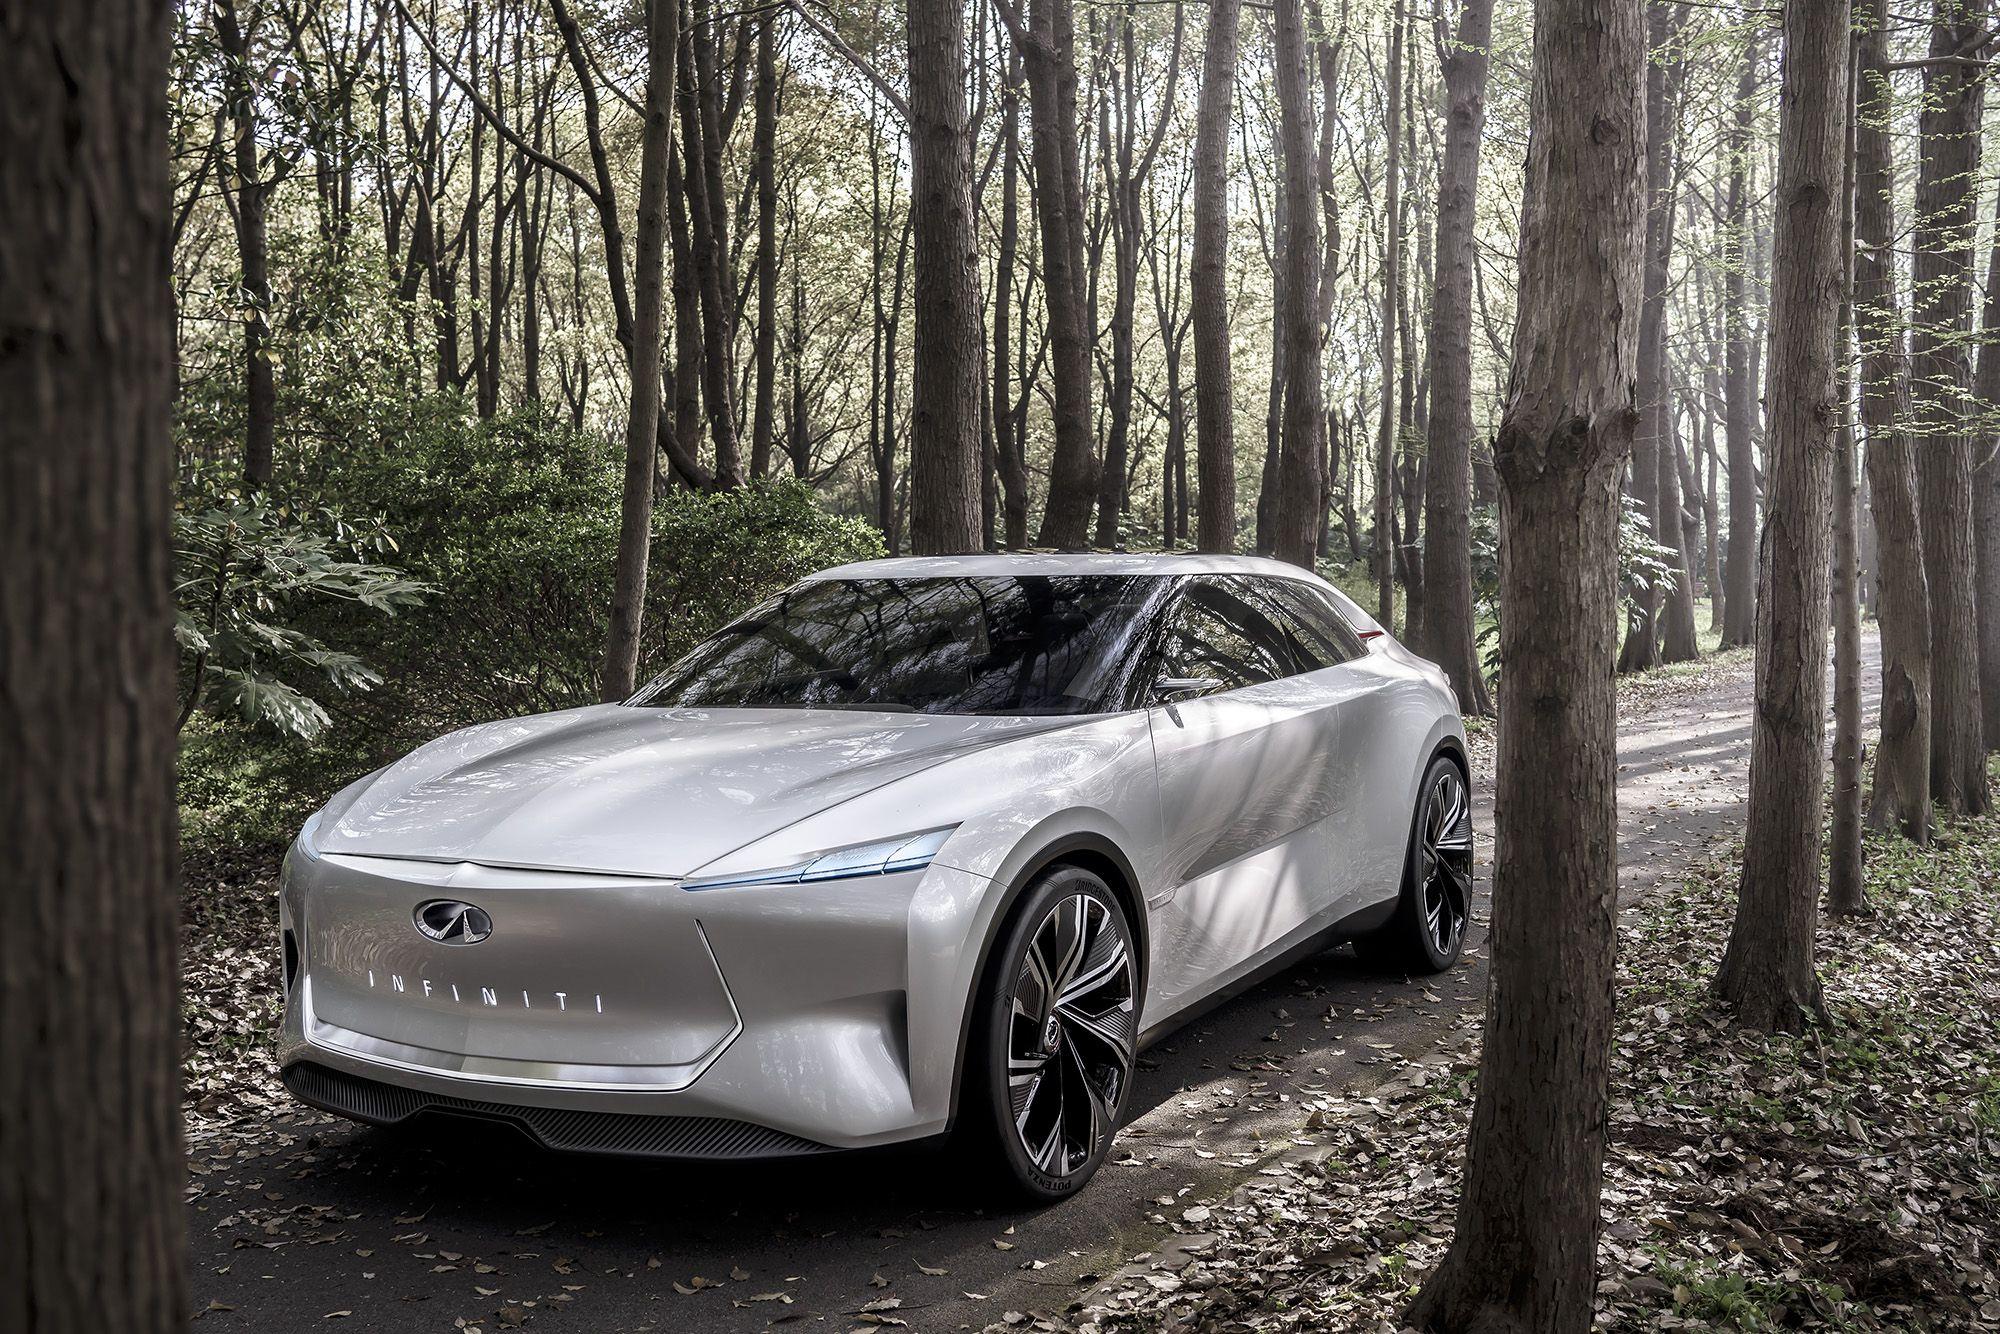 2021 infiniti q70l - car wallpaper